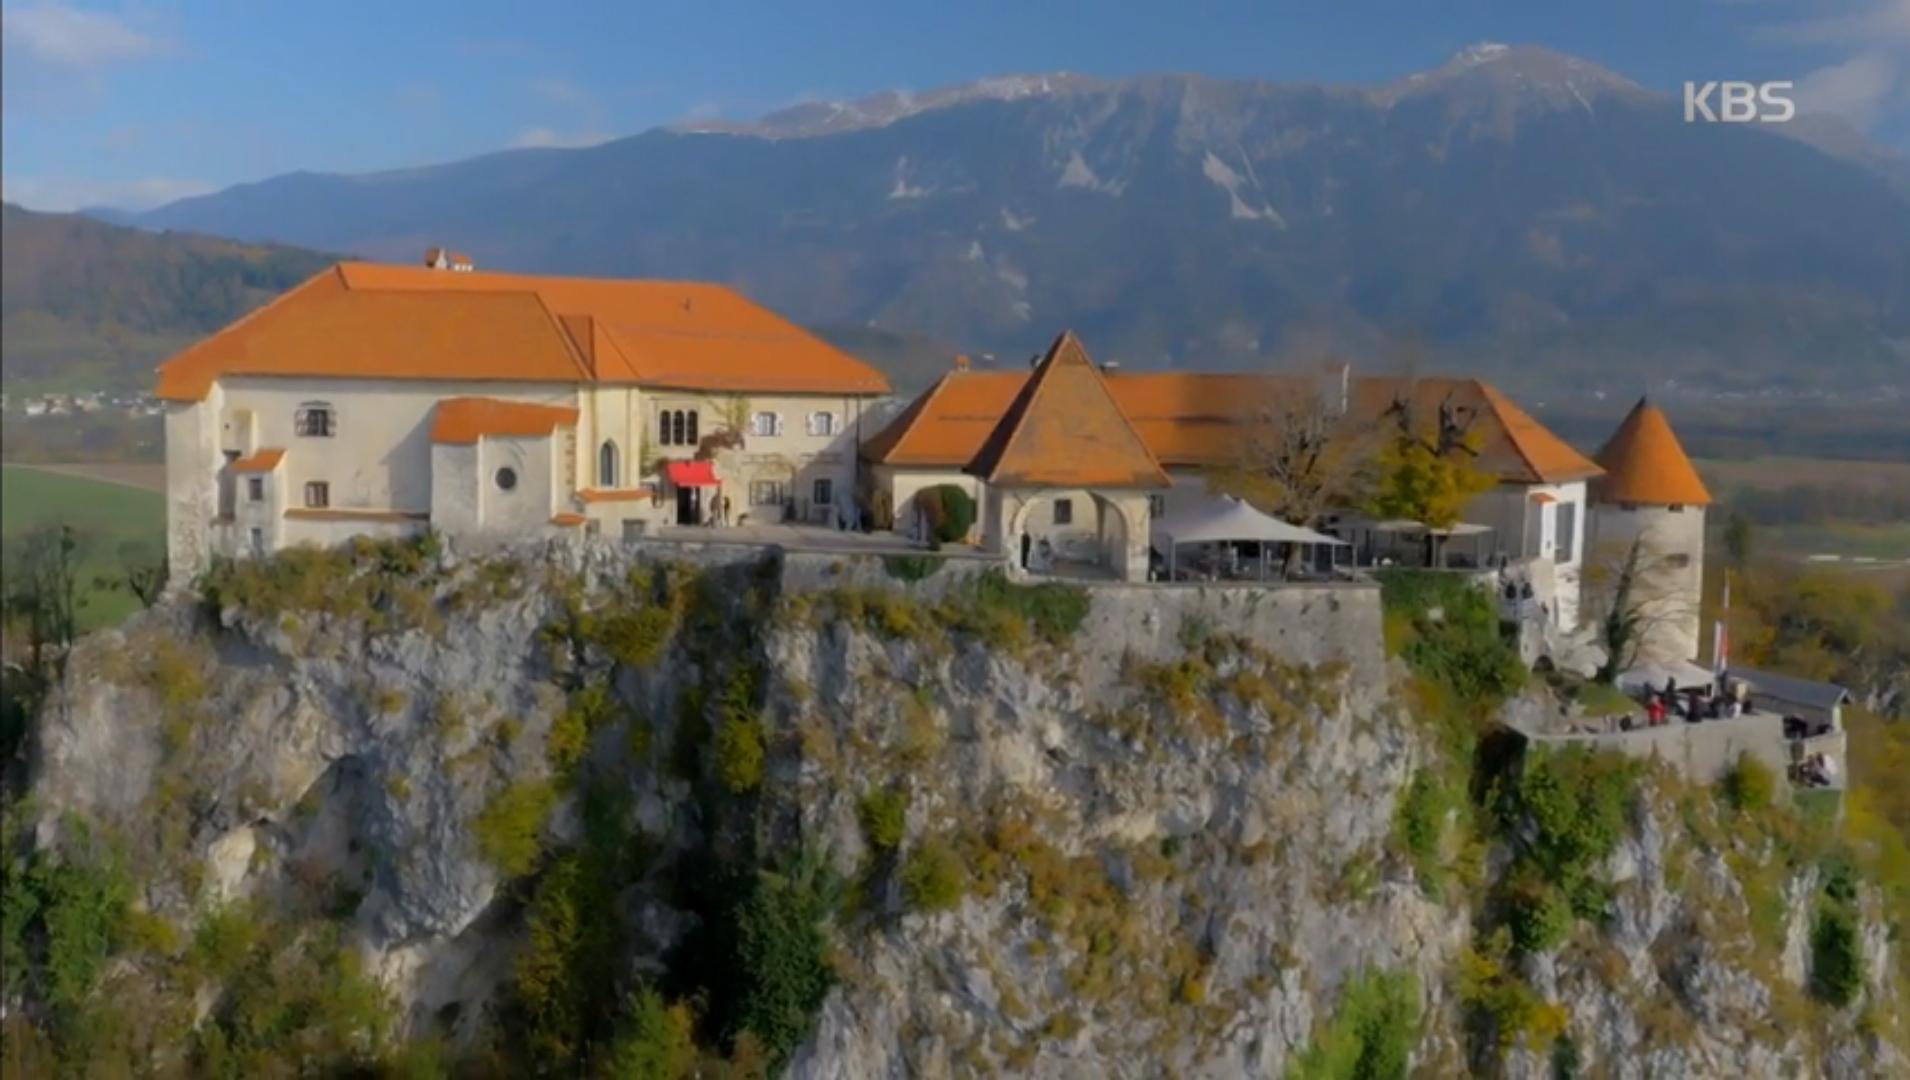 [TV성적표] <흑기사> 슬로베니아에서 1년전 <도깨비>의 부활을 꿈꾸나?